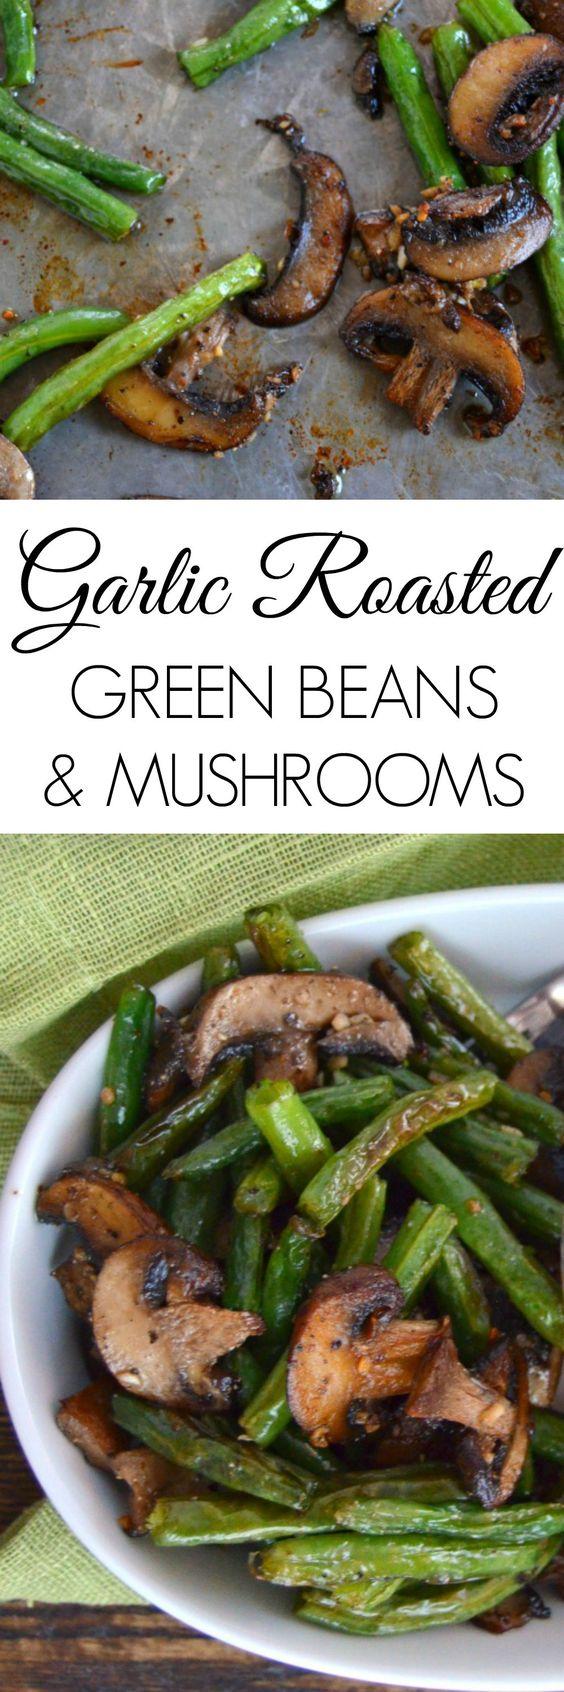 Garlic Roasted Green Beans and Mushrooms.